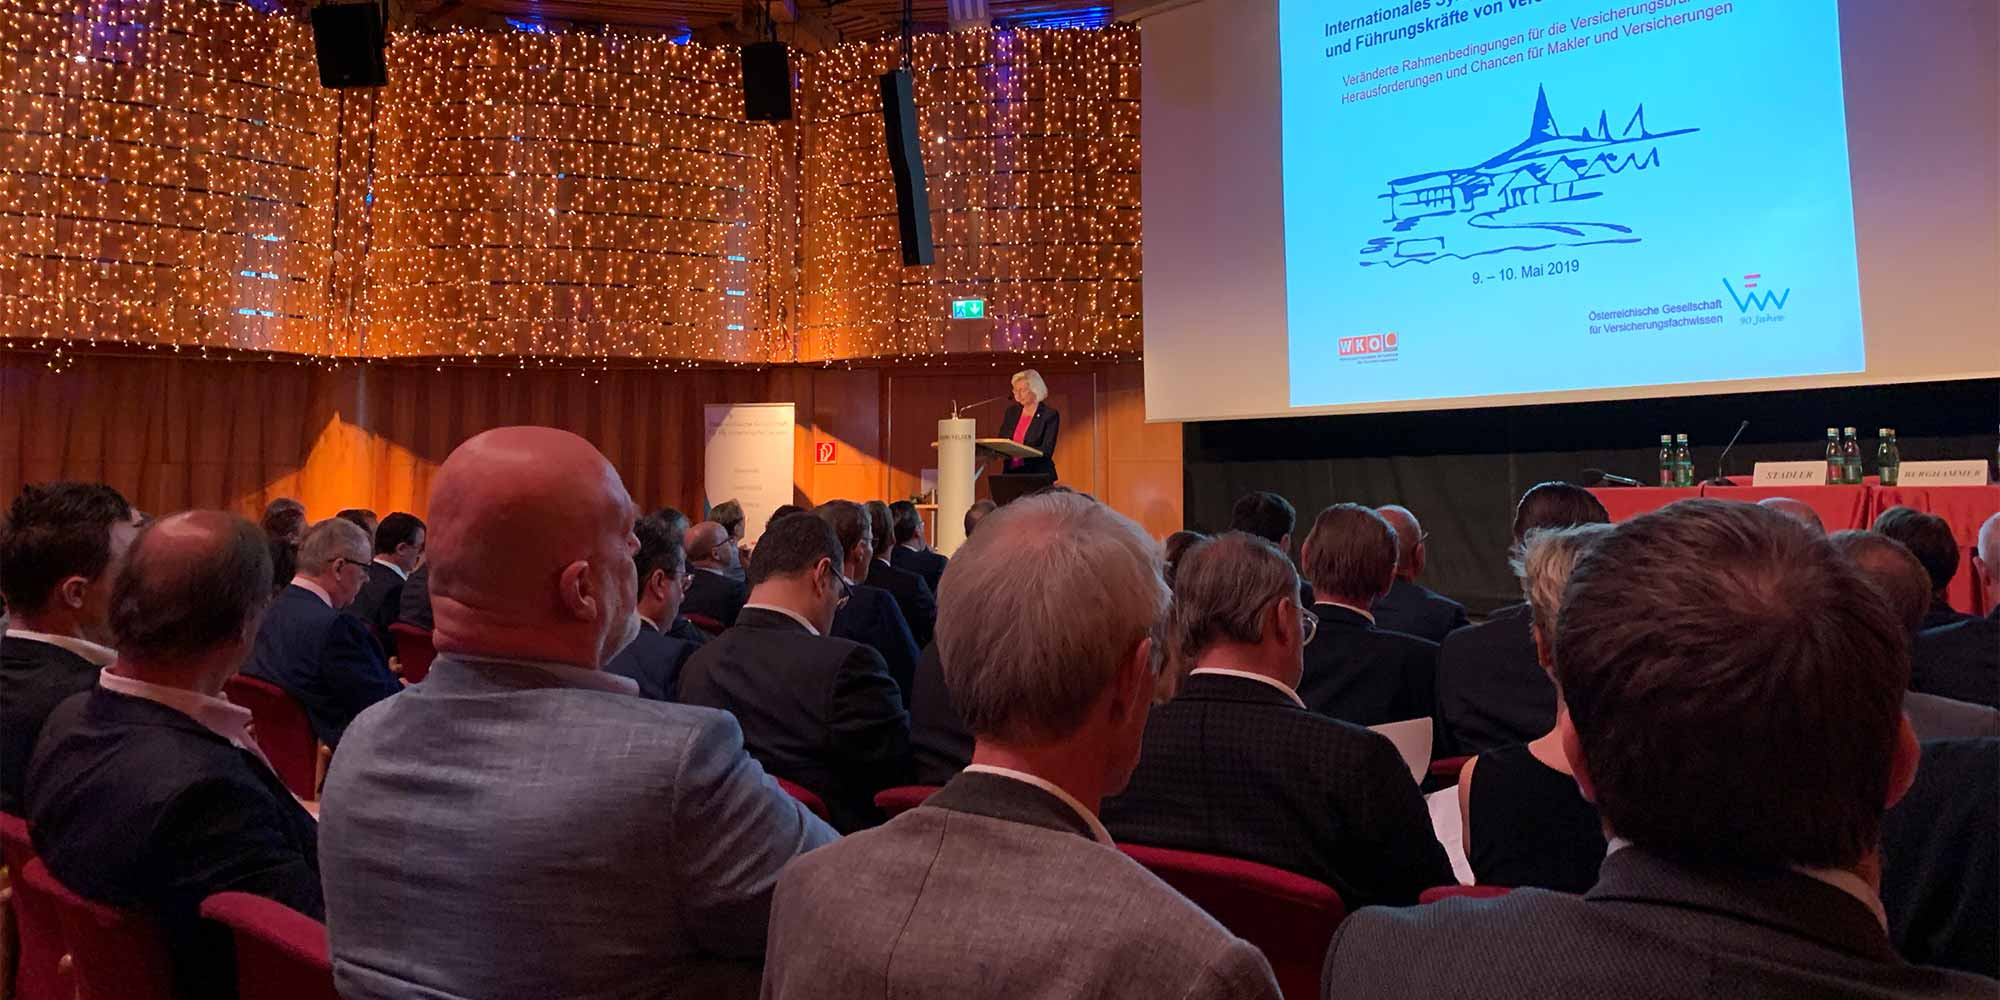 International Symposium Velden